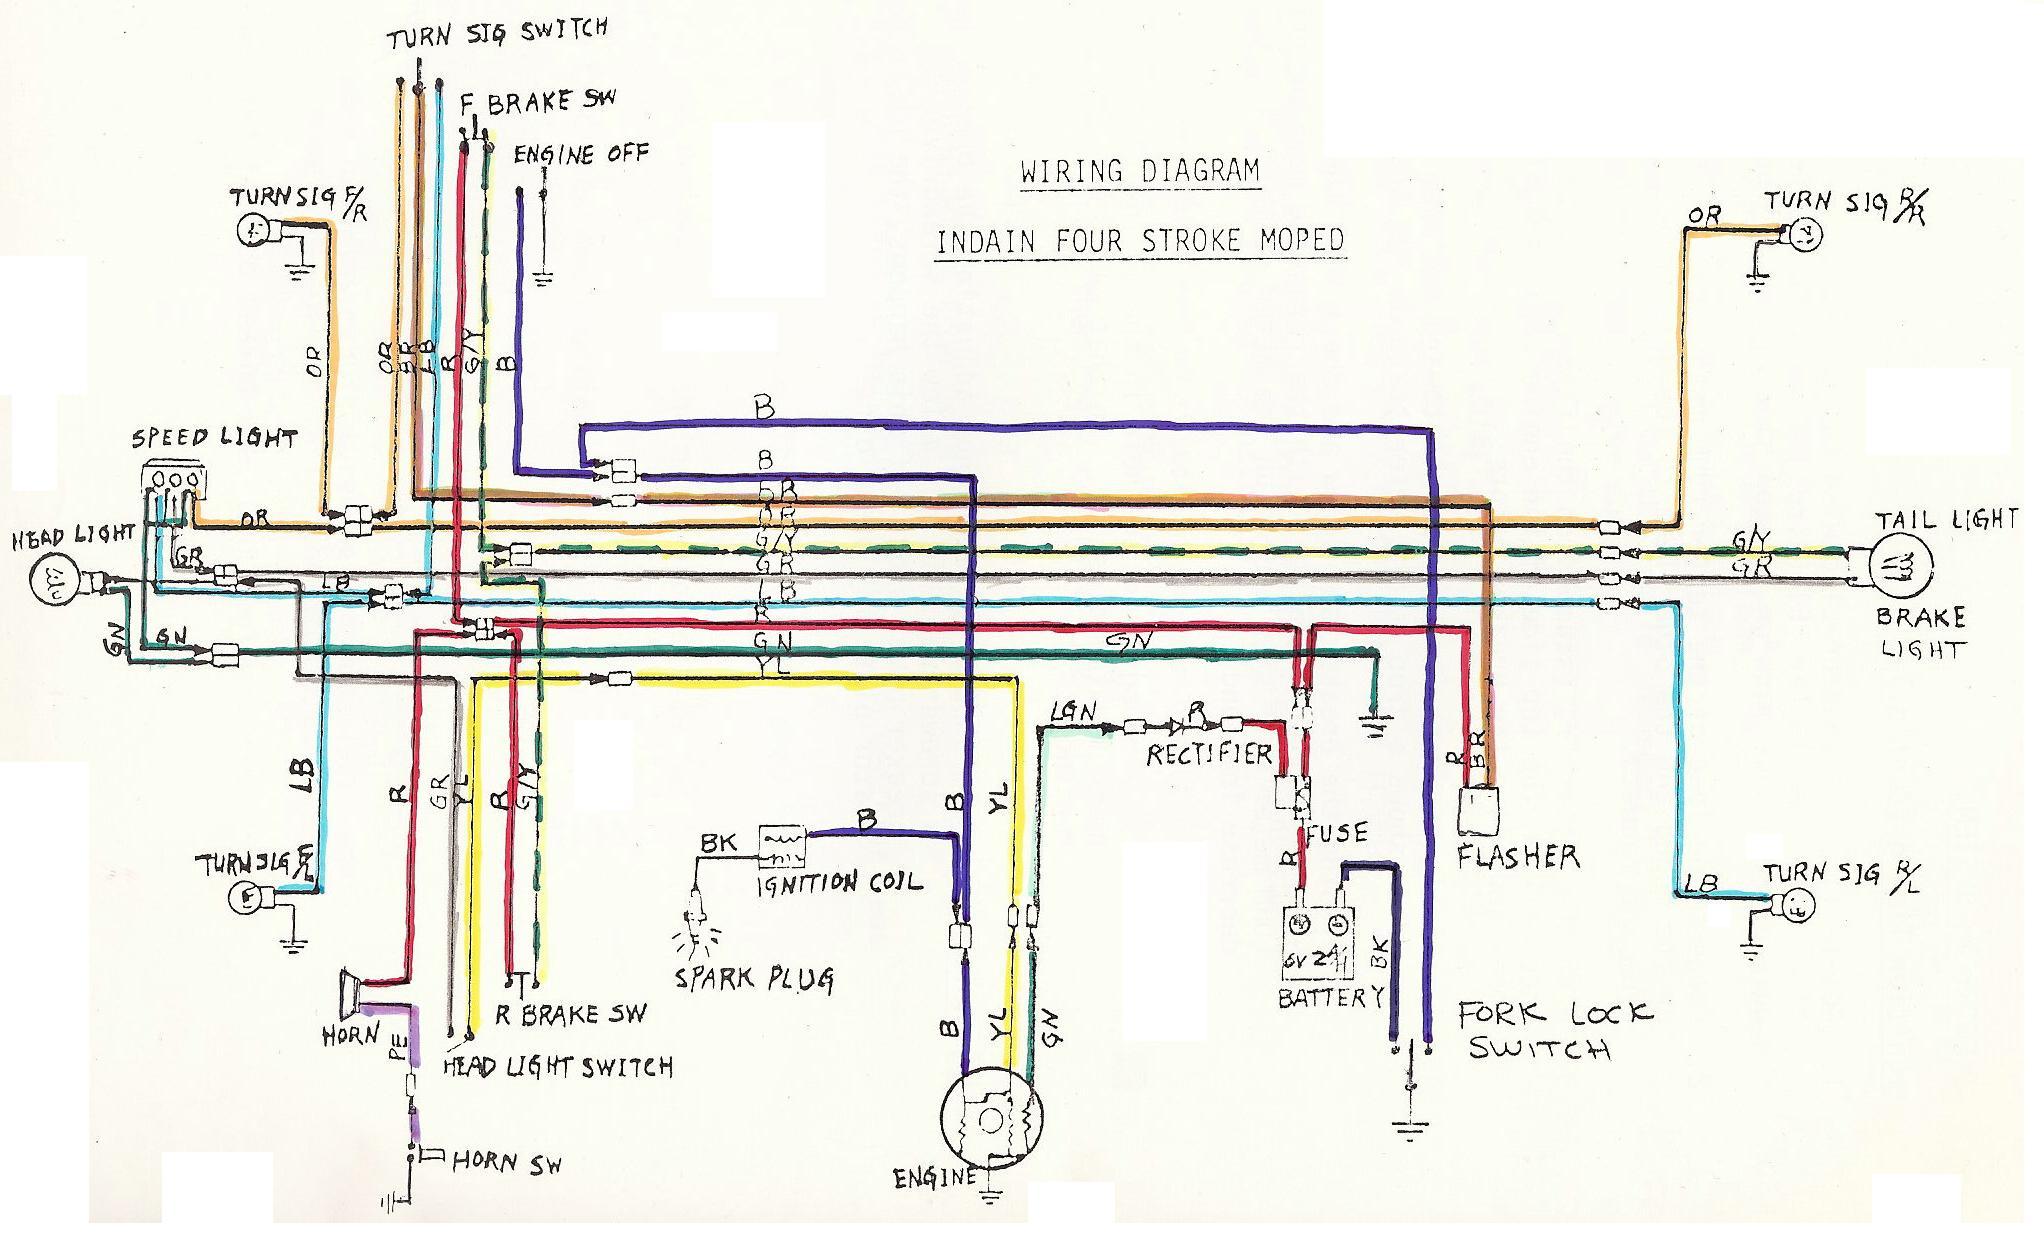 na50 wiring diagram wiring libraryna50 wiring diagram wiring library ford electrical wiring diagrams na50 wiring diagram